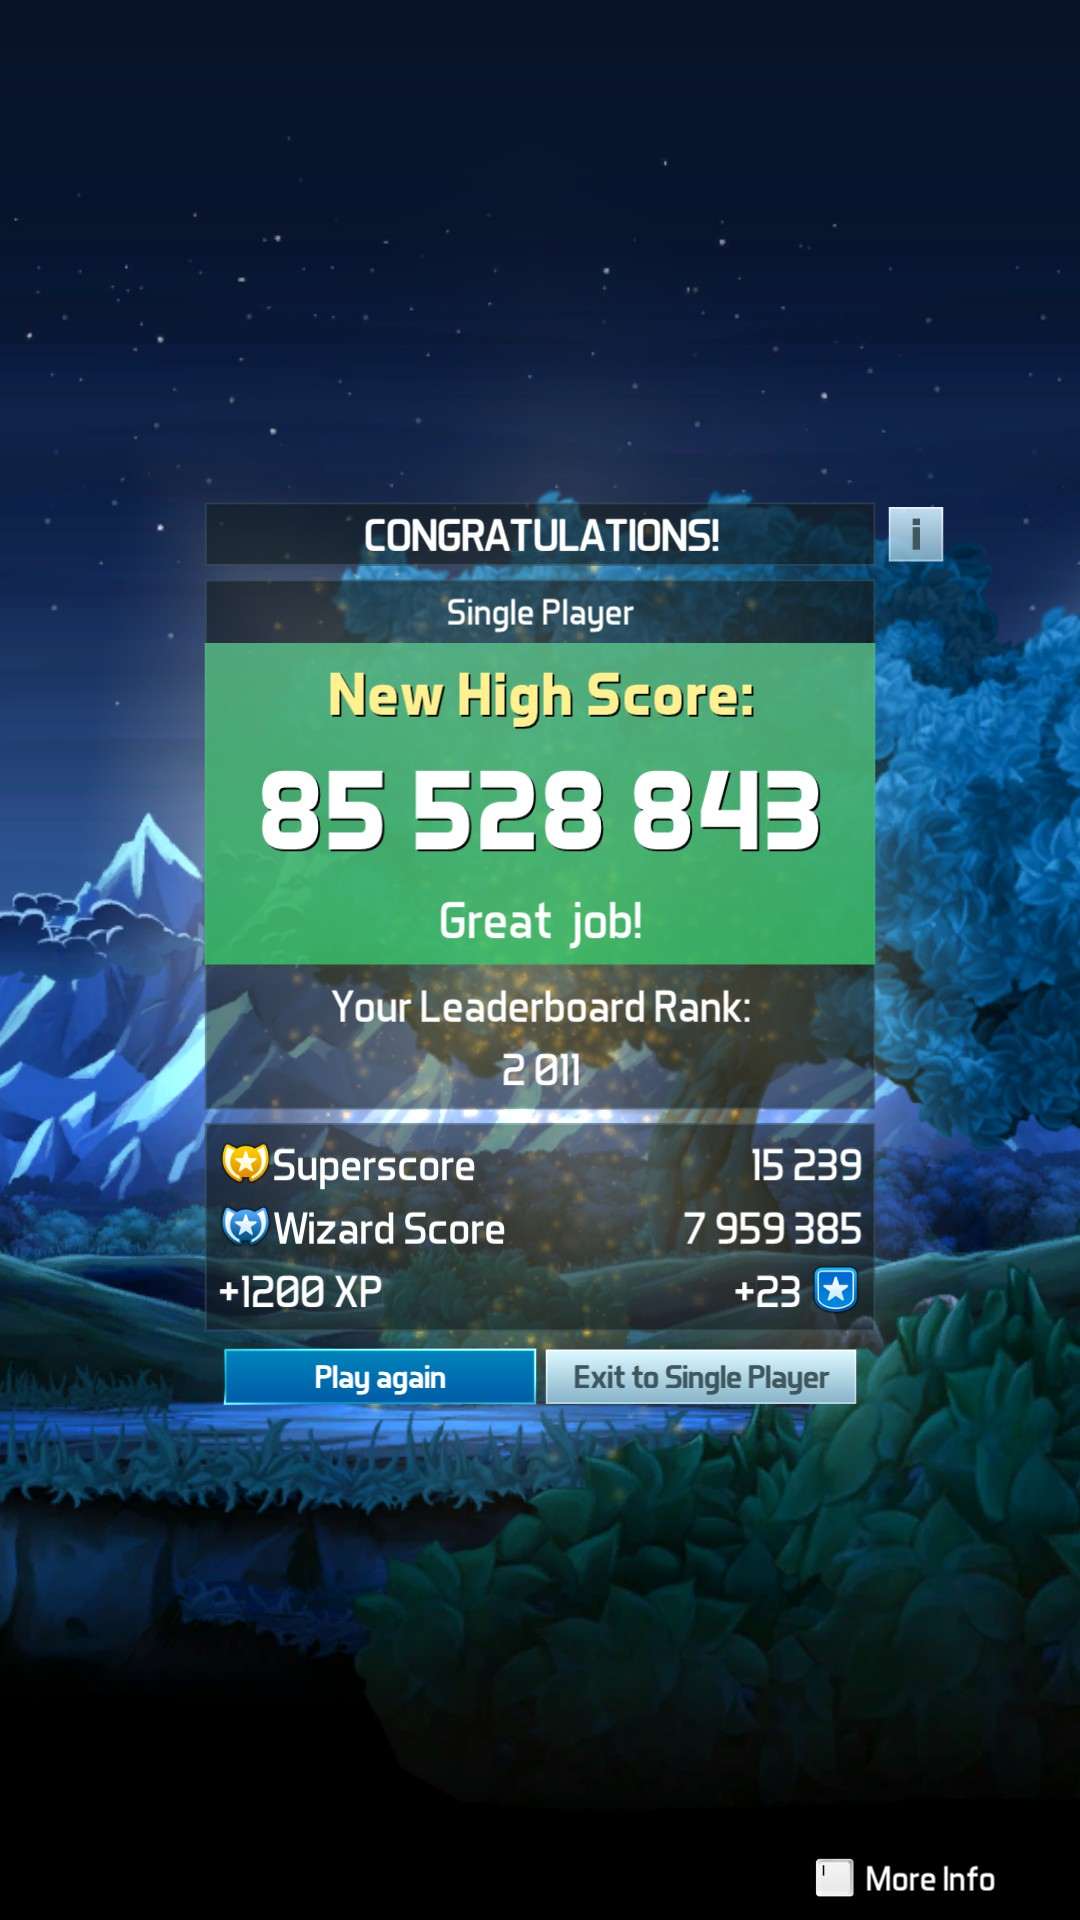 GTibel: Pinball FX3: CastleStorm (PC) 85,528,843 points on 2019-05-02 05:53:37